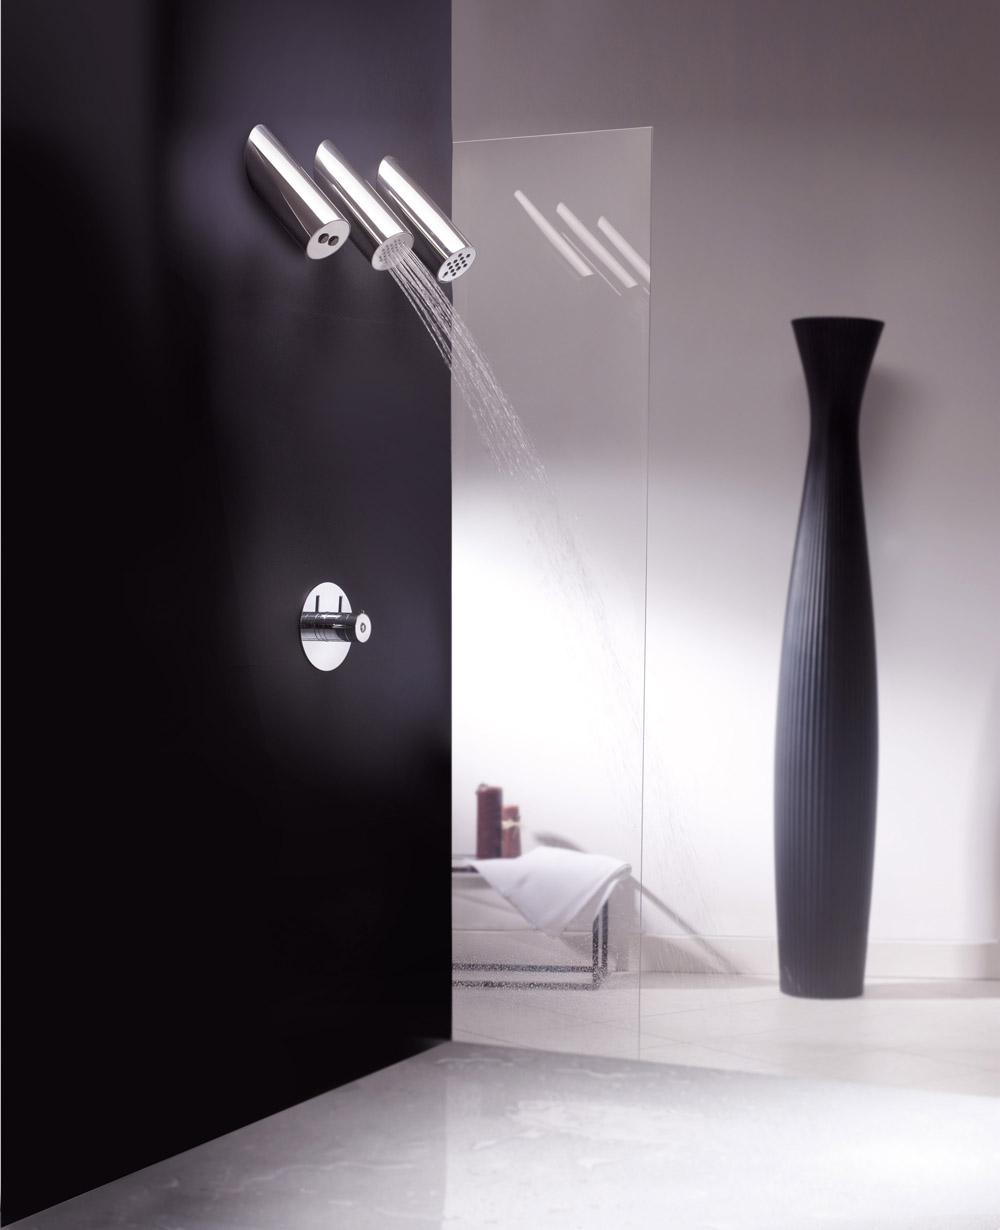 Cabeça de chuveiro Do Re Mi Fratelli Frattini